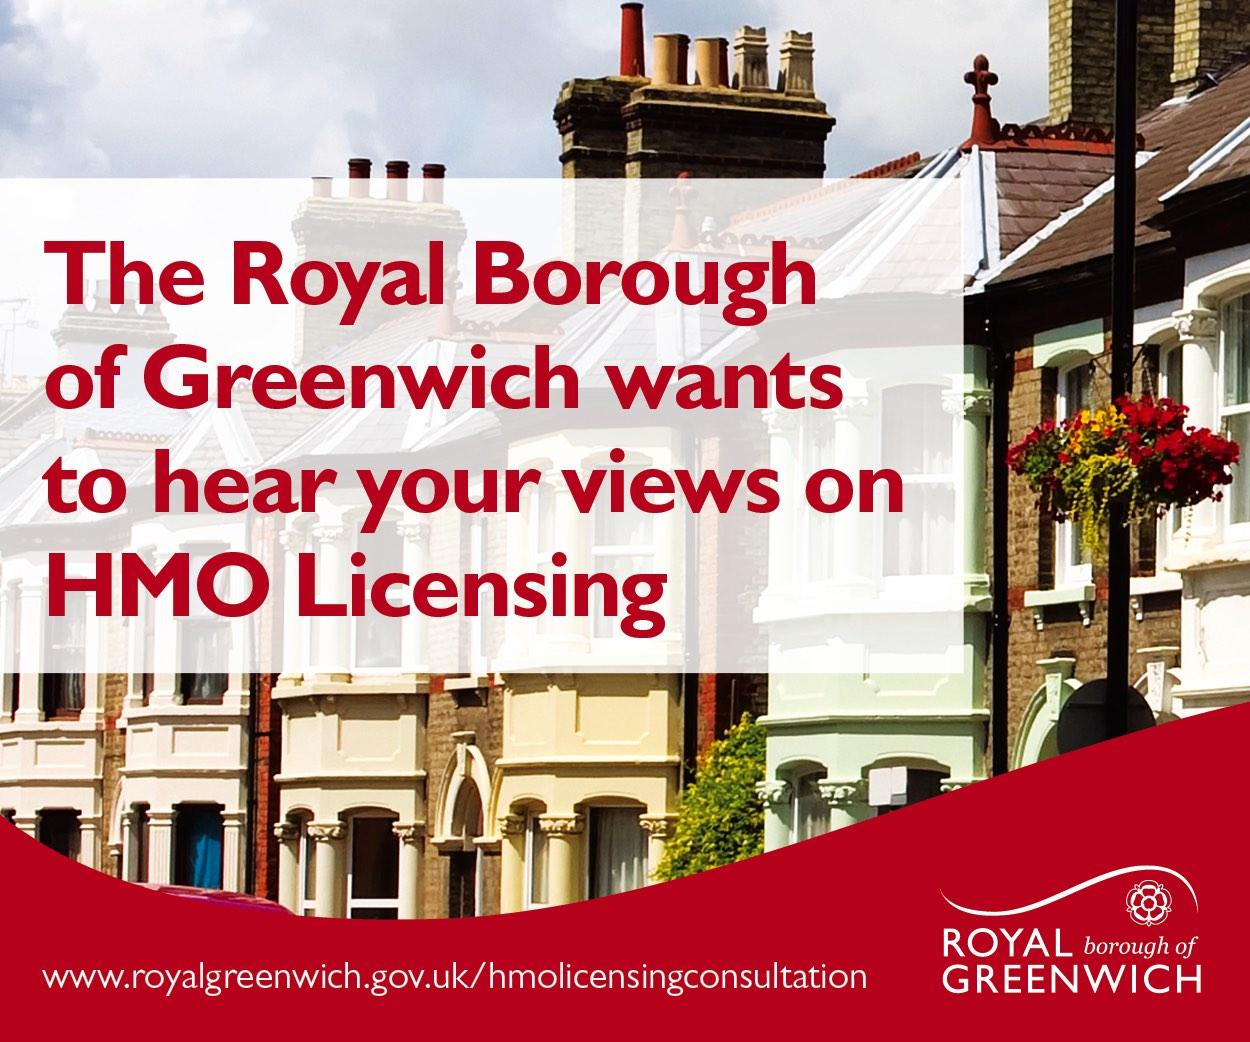 Greenwich HMO Licensing consultation